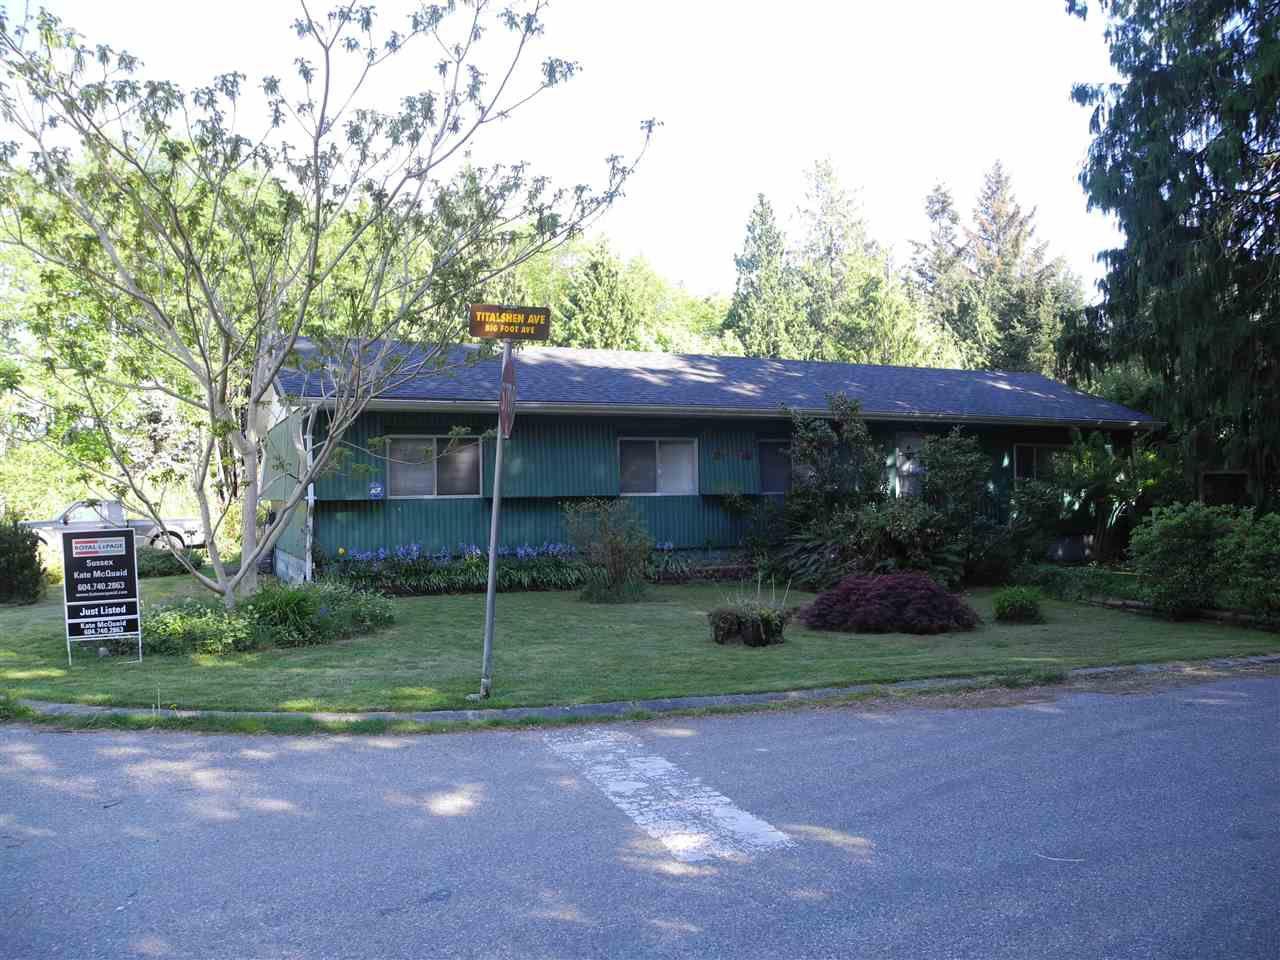 "Main Photo: 1580 TITALSHEN Avenue in Sechelt: Sechelt District Manufactured Home for sale in ""Stalashen"" (Sunshine Coast)  : MLS®# R2328648"